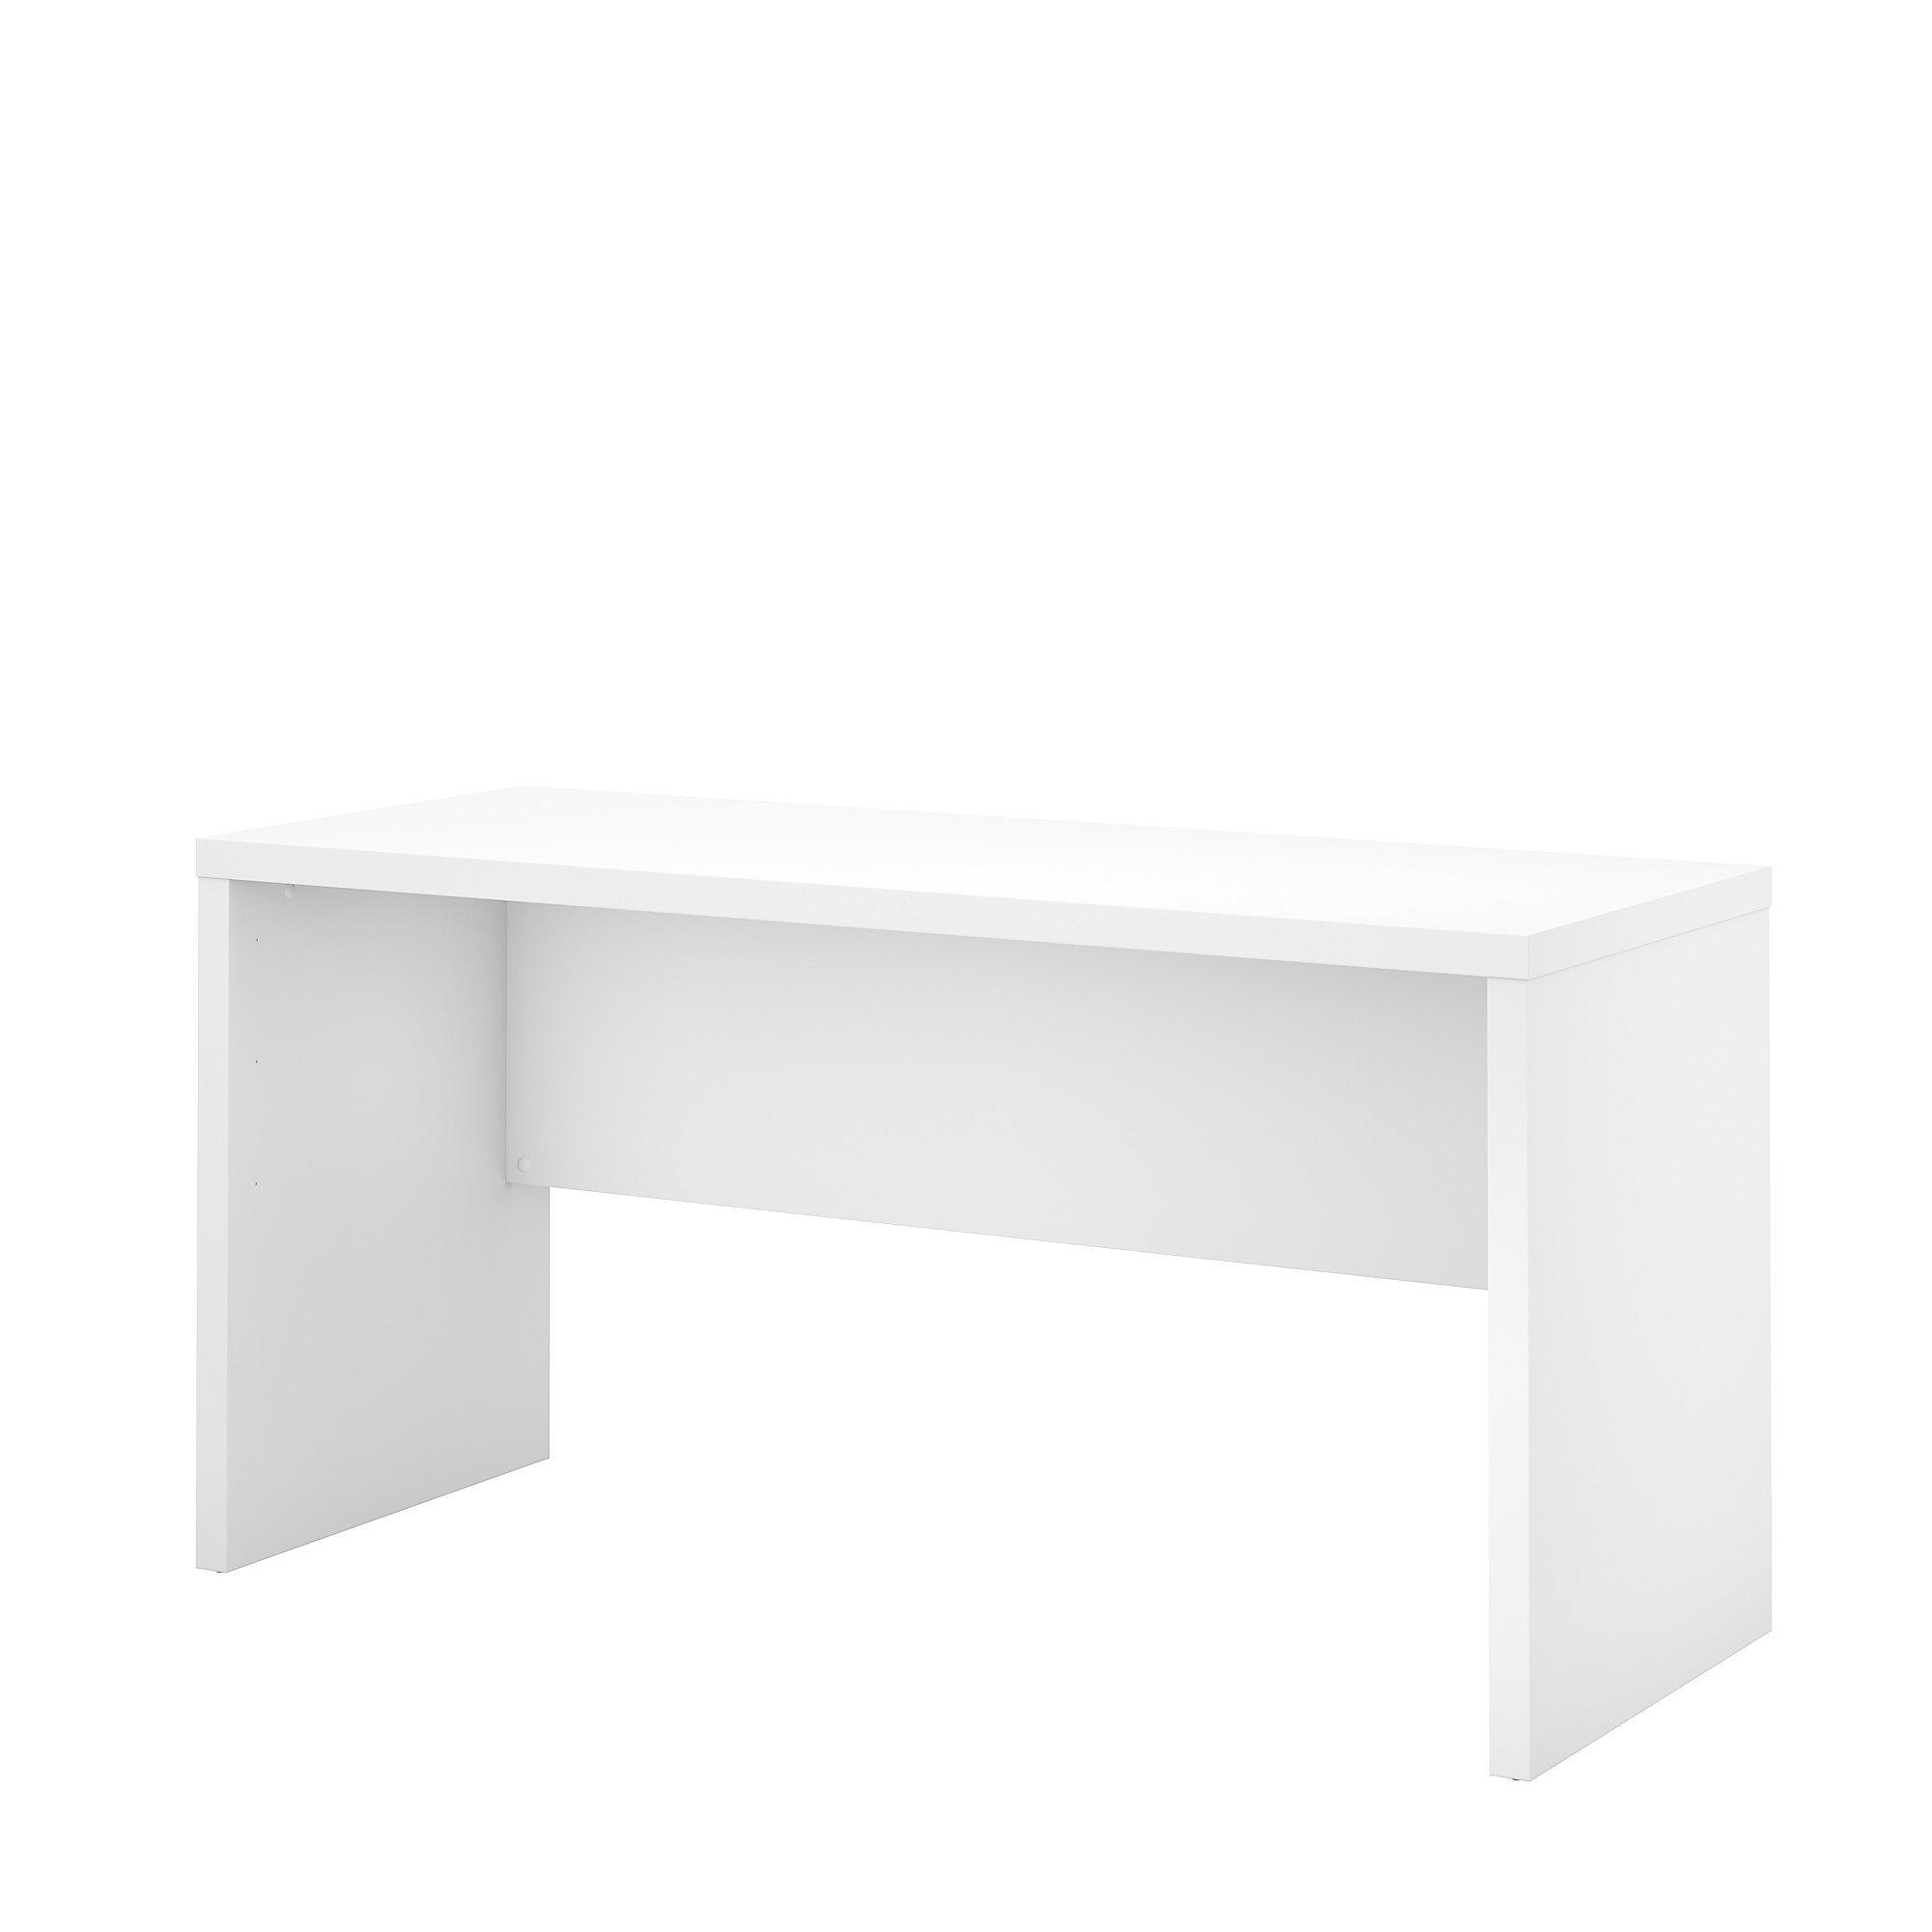 Office by kathy ireland Echo 60W Credenza Desk in Pure White by Office by kathy ireland